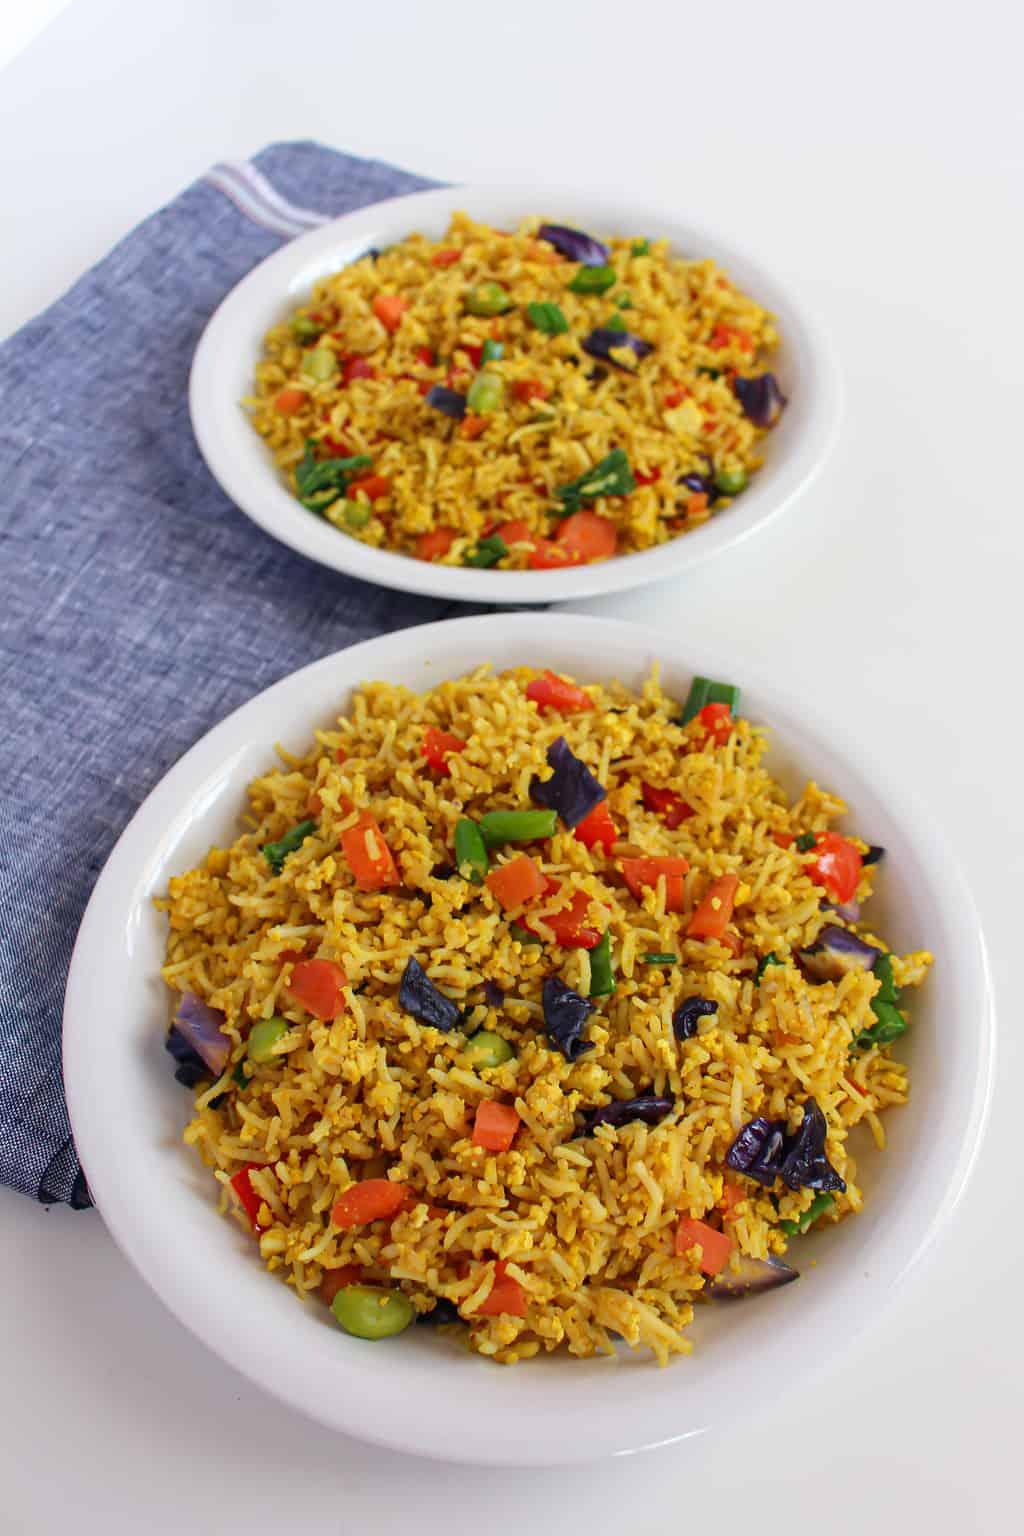 2 plates of gluten free, vegan low-FODMAP fried rice